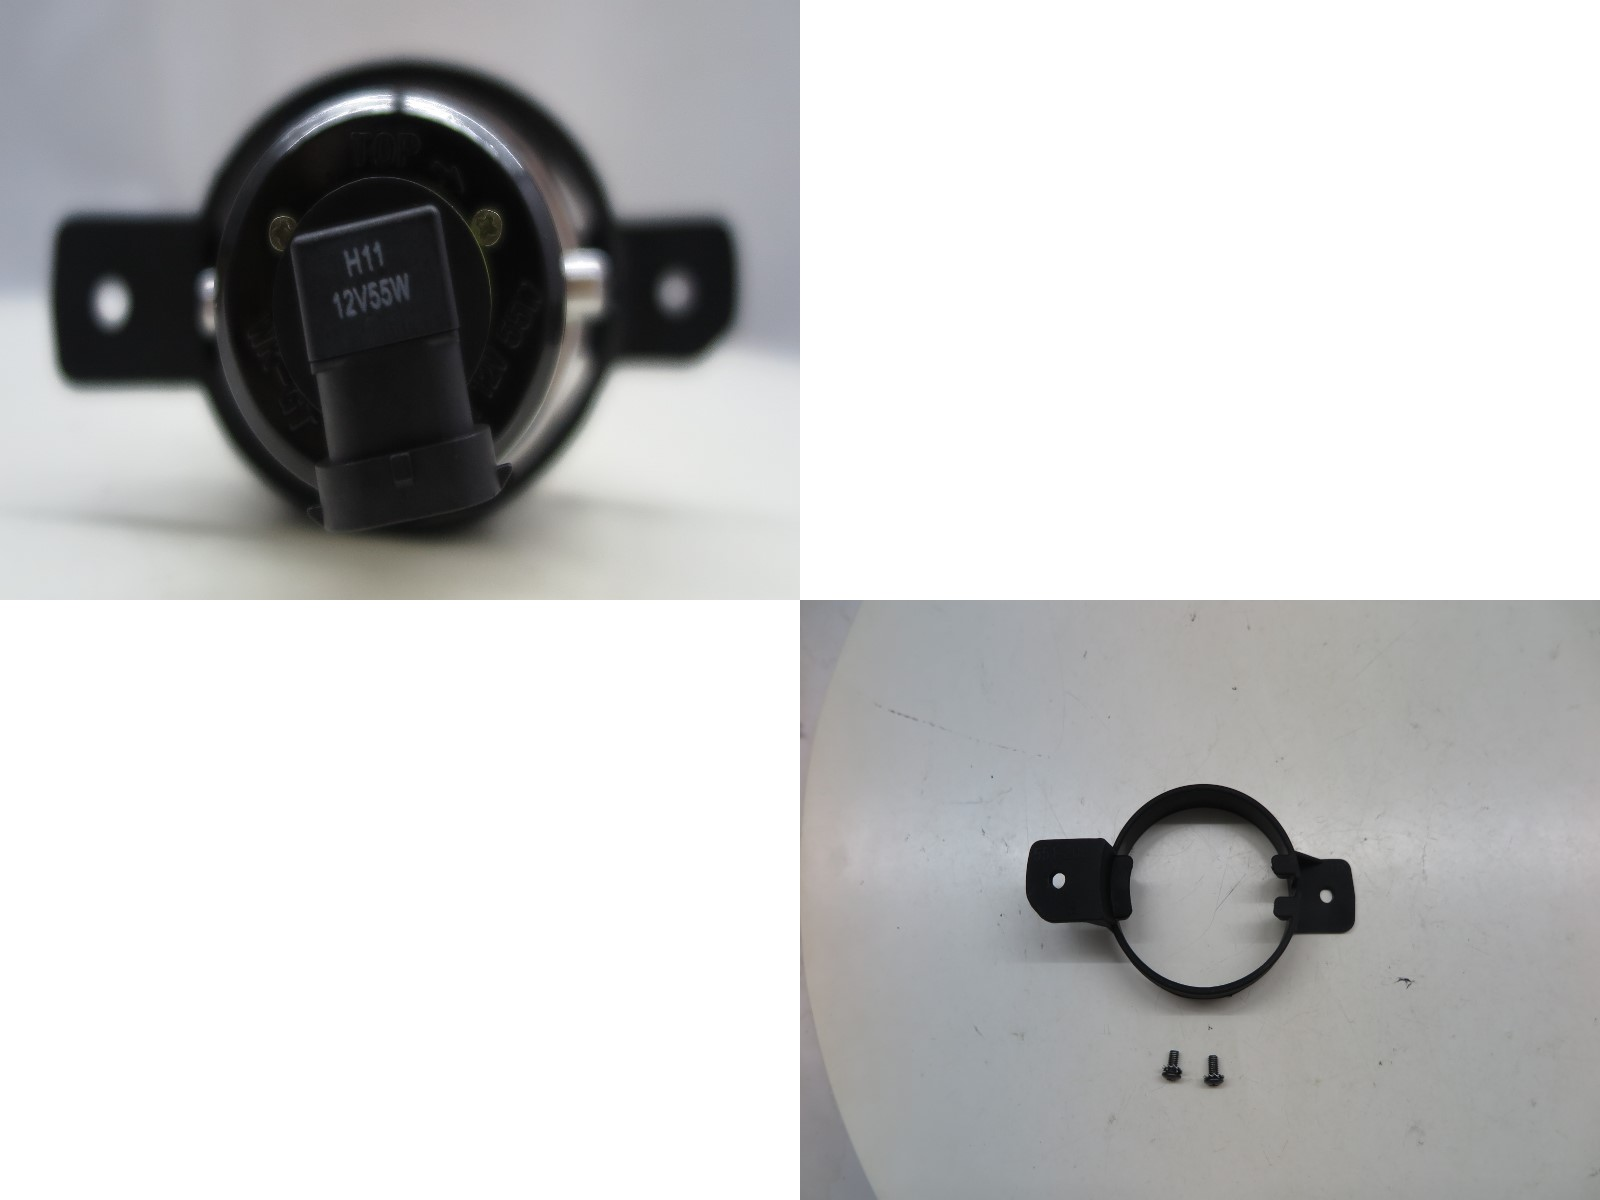 thumbnail 4 - Grand Livina L10 MK1 2007-2019 Wagon 5D Projector Fog Light Black for NISSAN